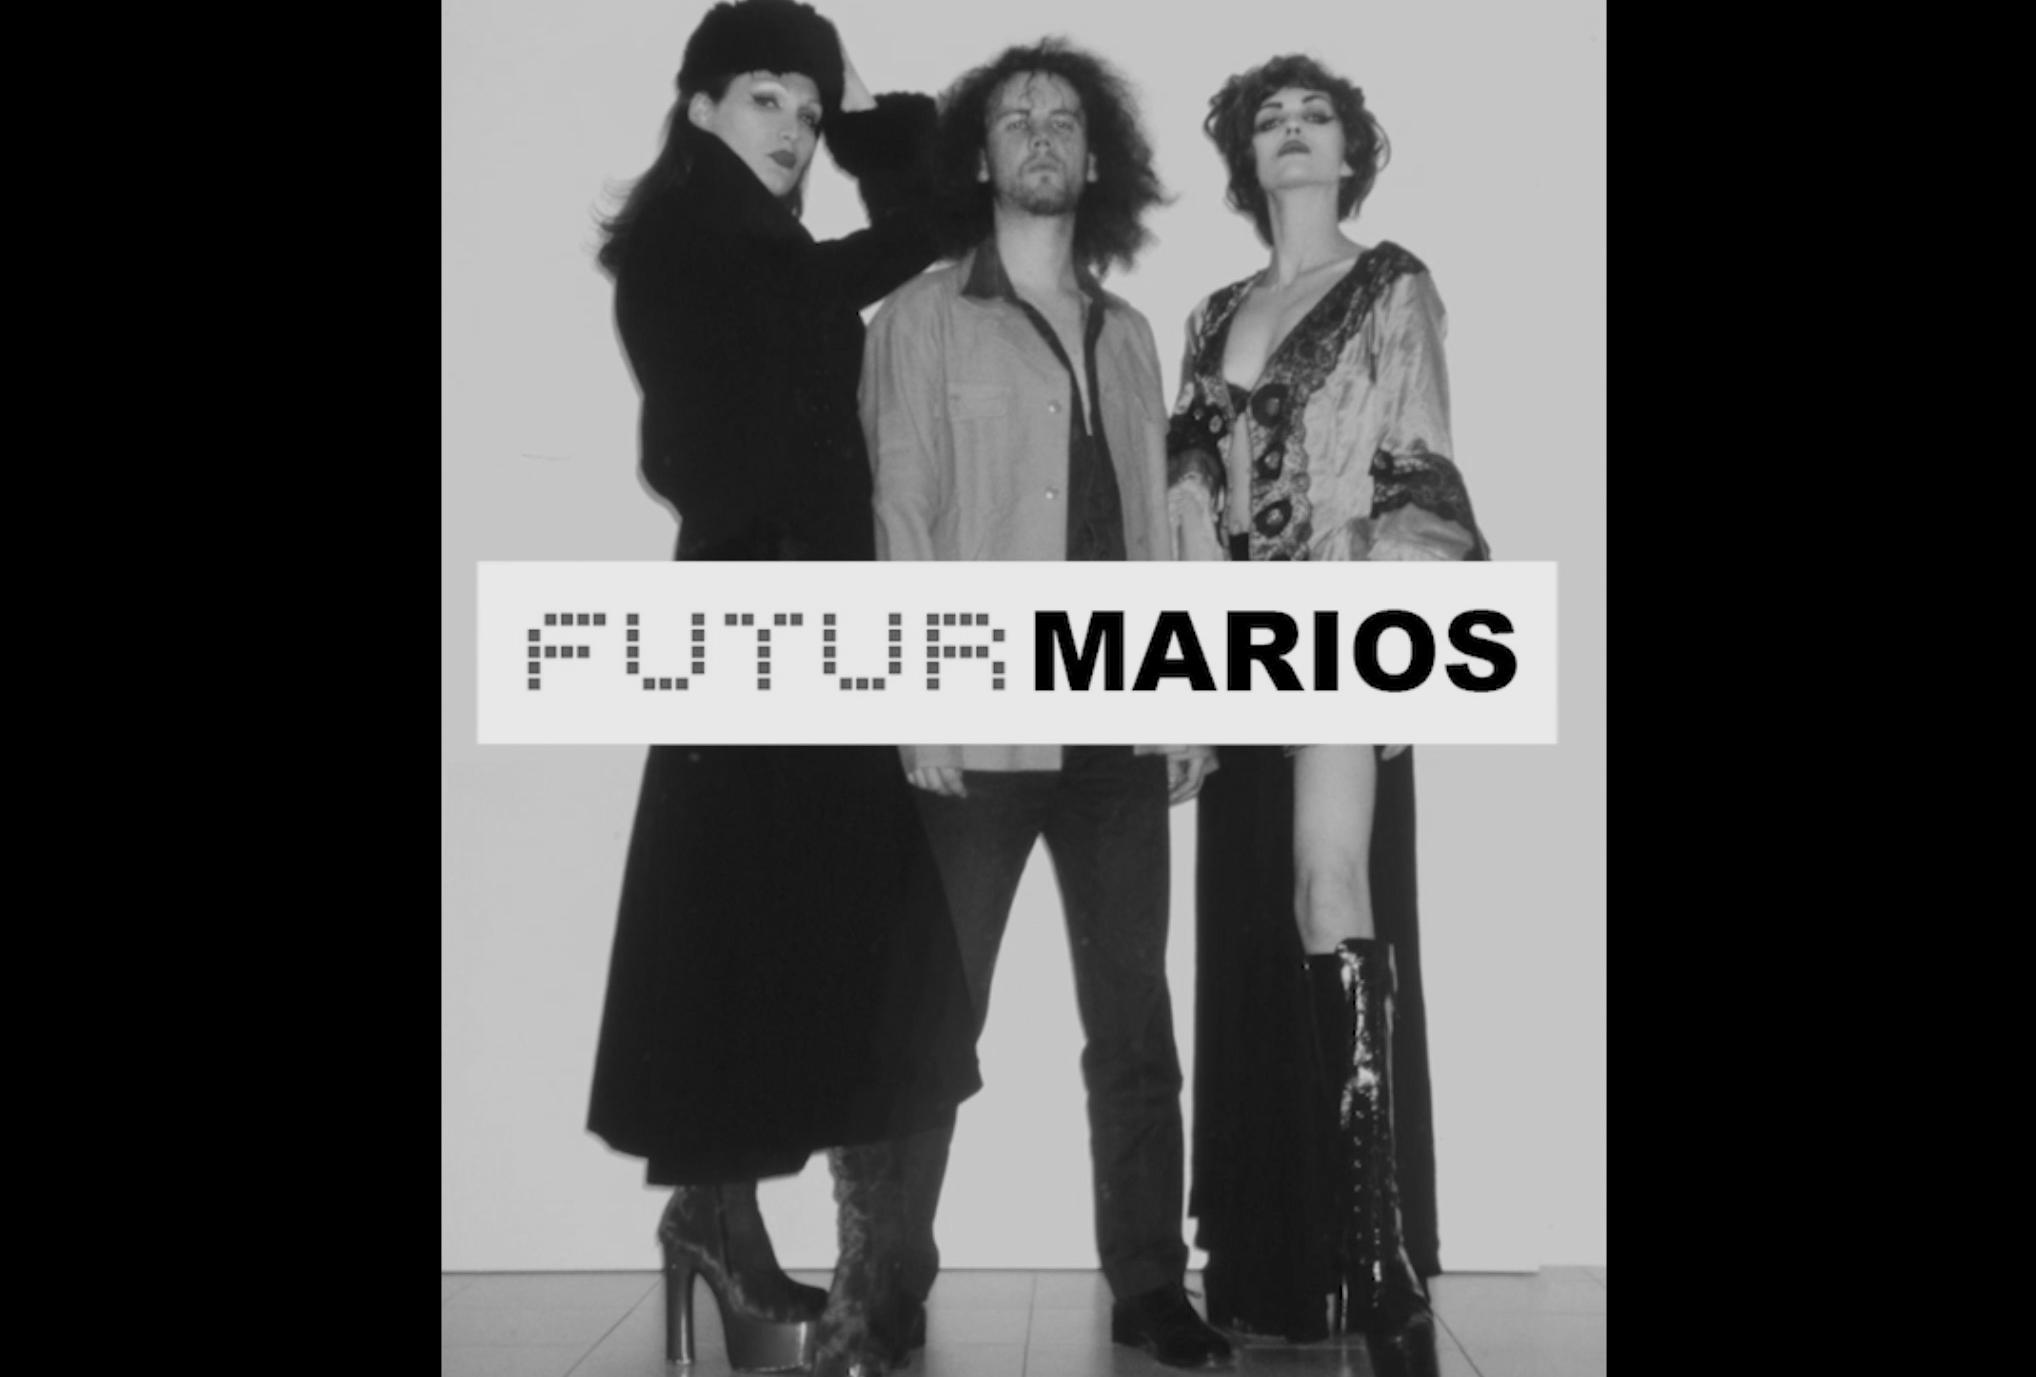 FuturMARIOS - MARIOS - FuturDome - Milano - evento -2020